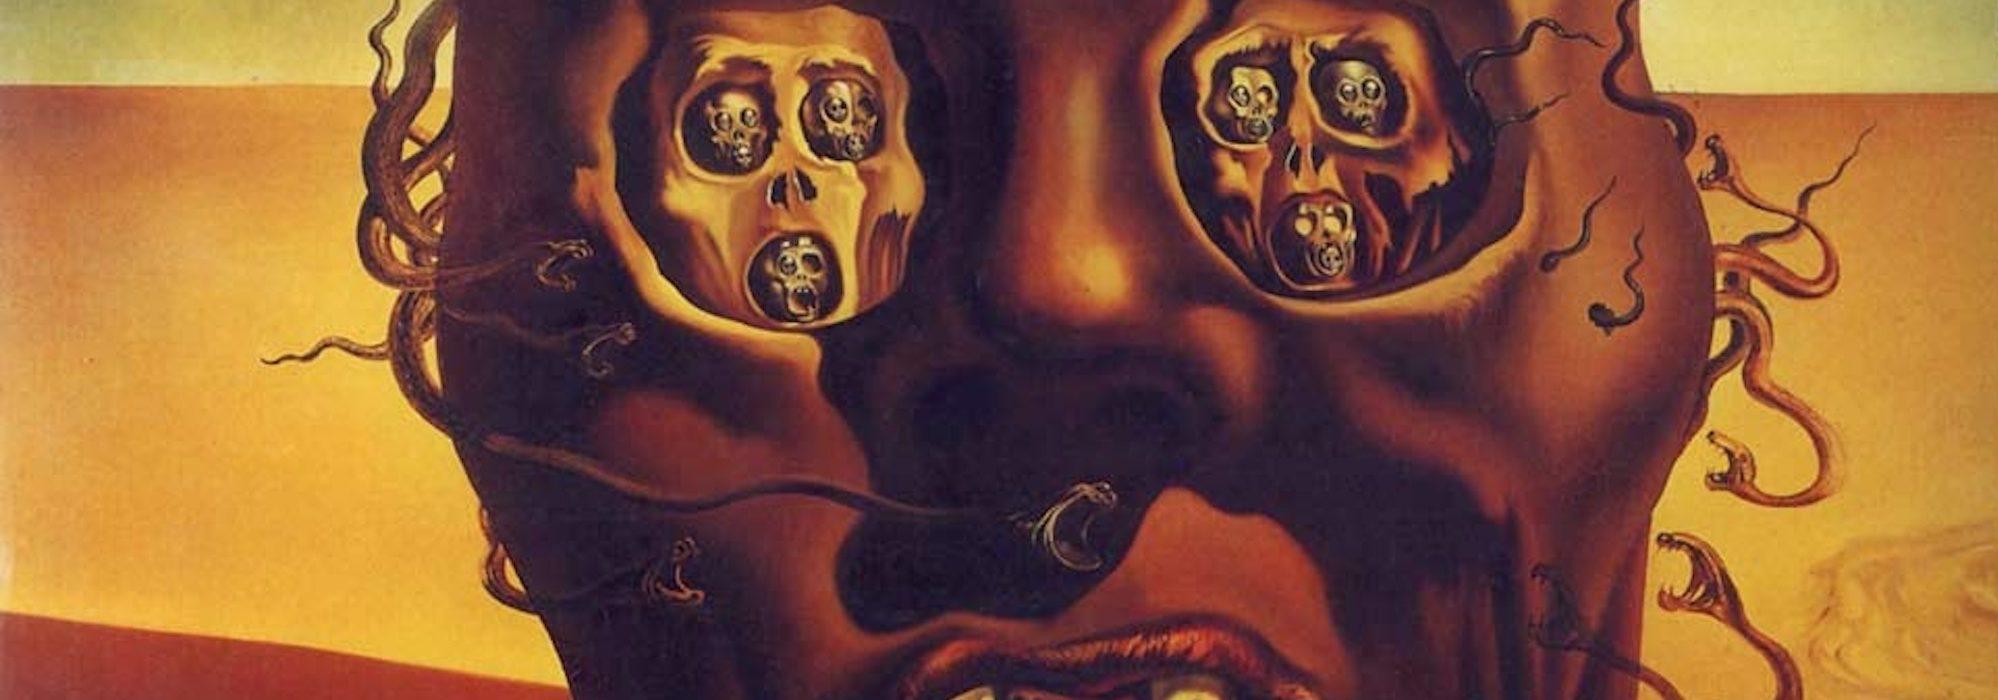 O Rosto da Guerra - Salvador Dalí